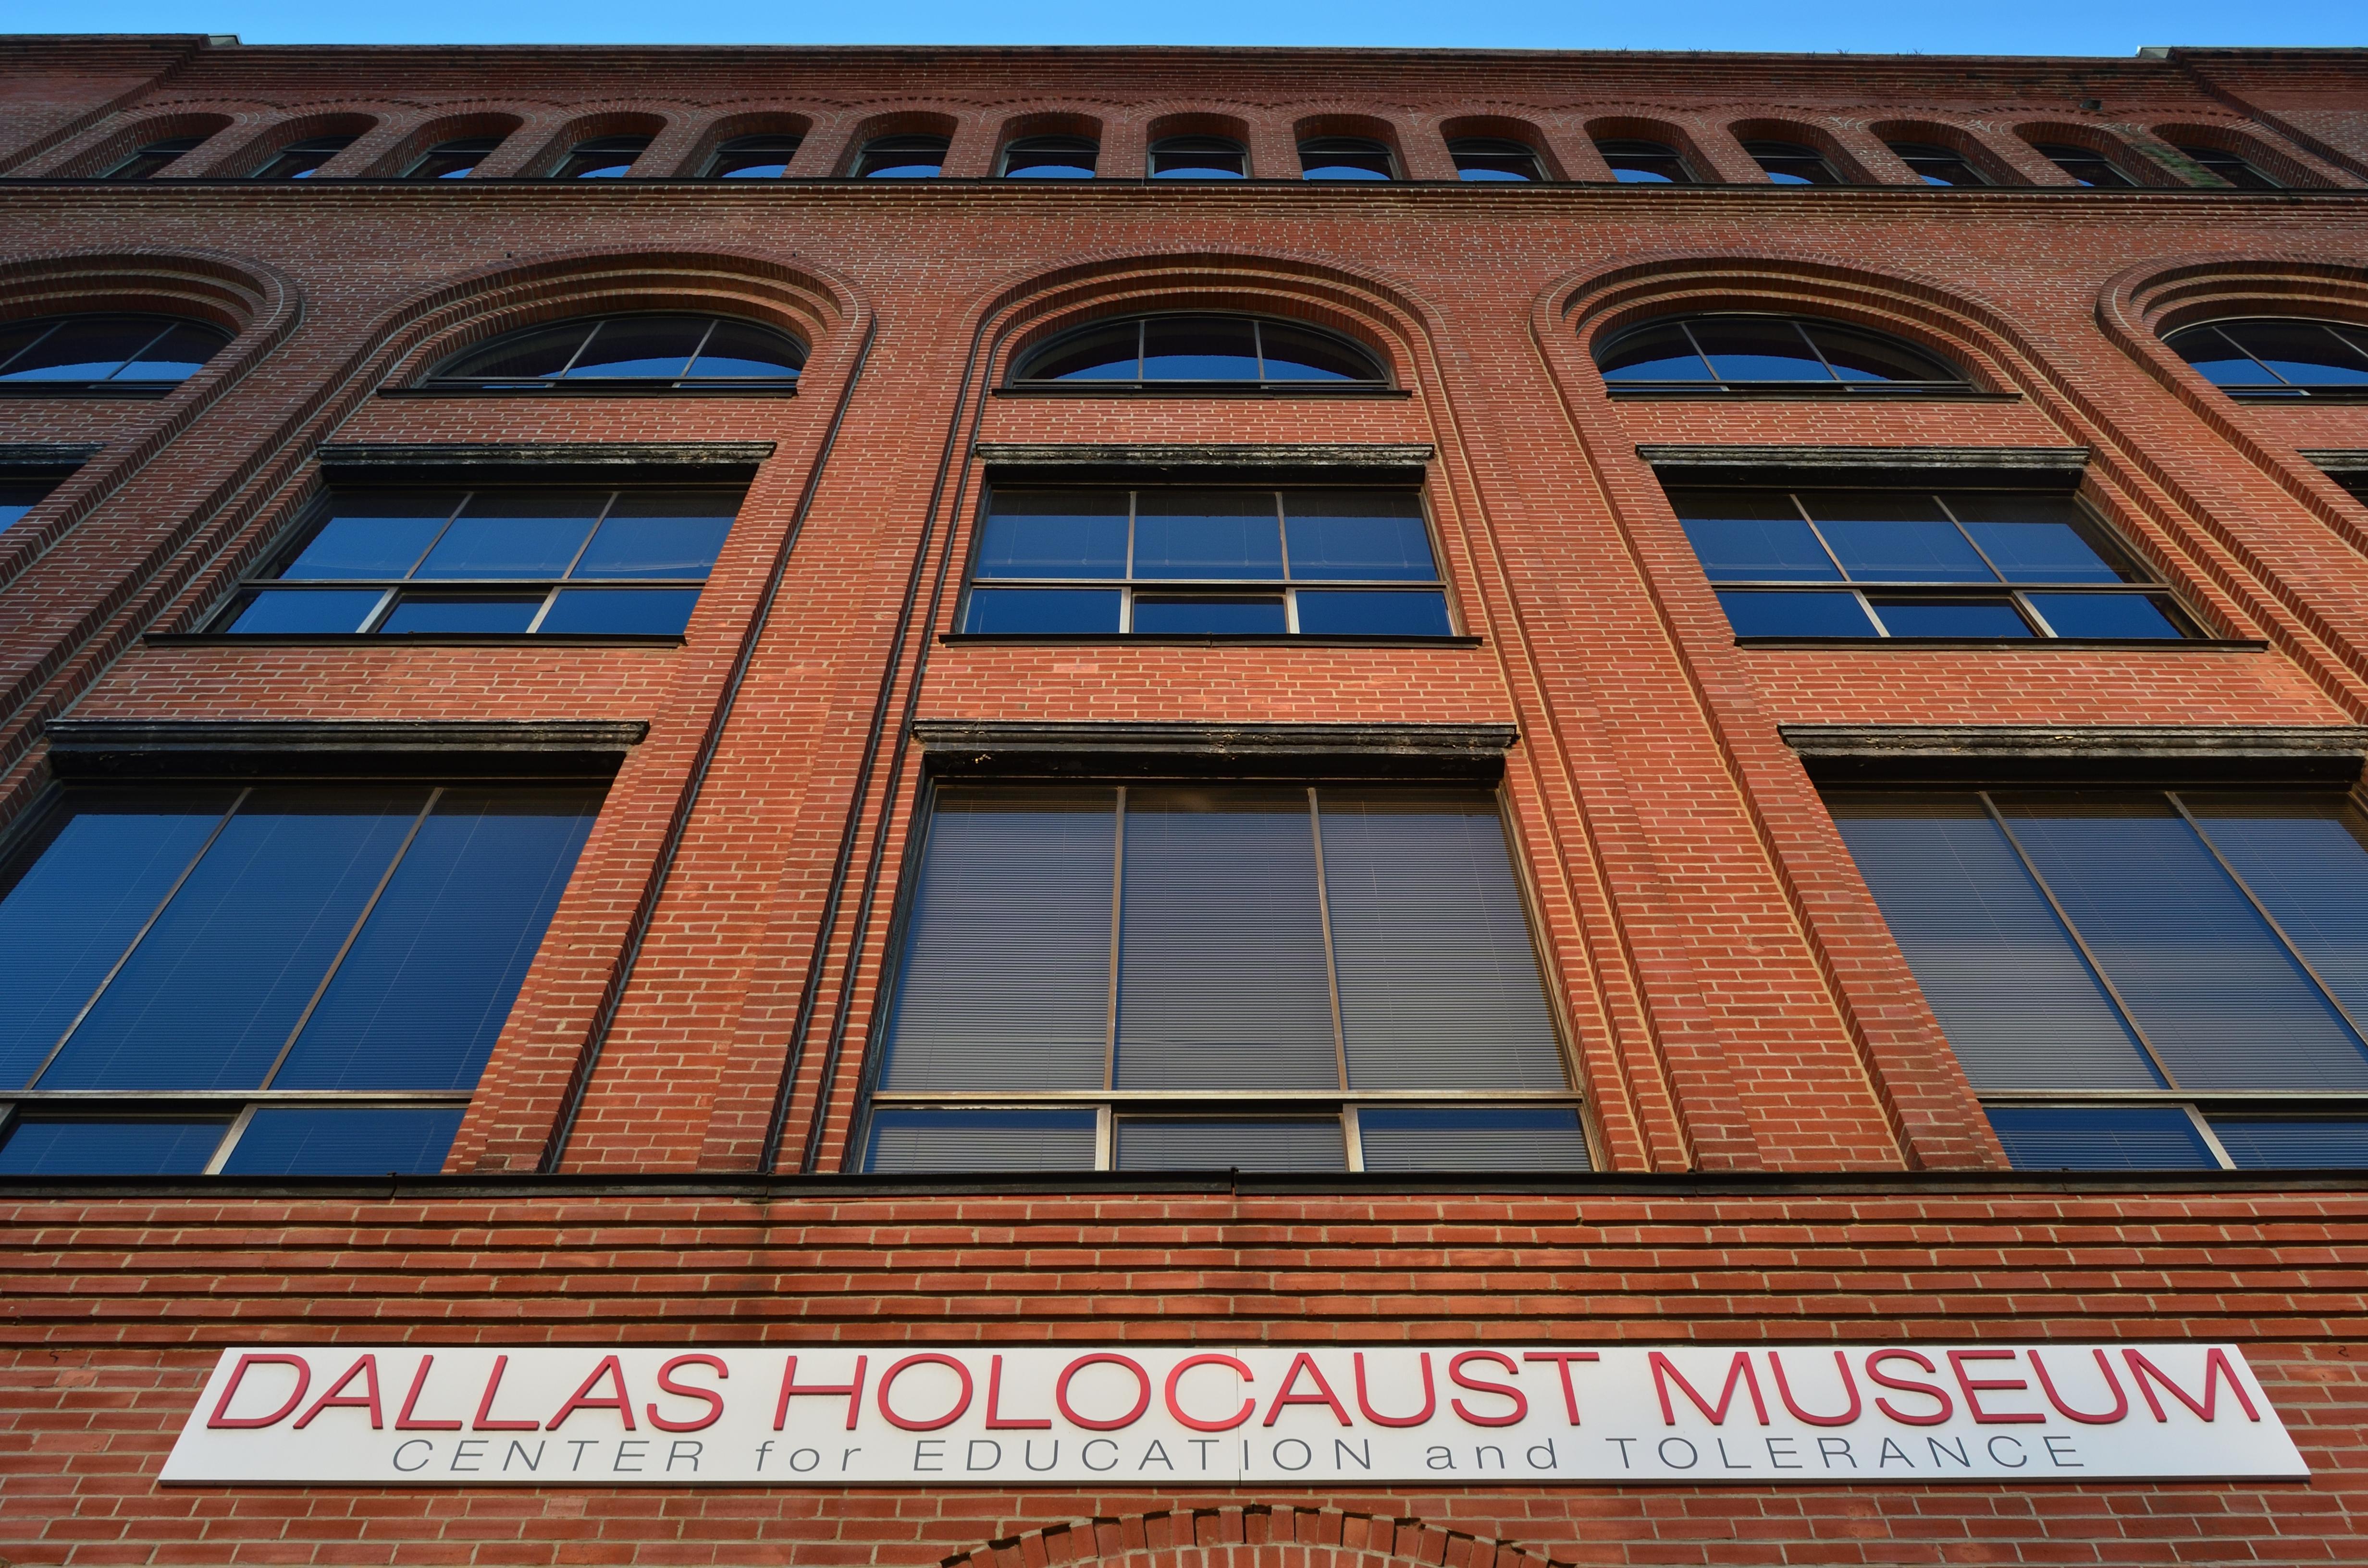 Dallas Holocaust Museum/Center for Education & Tolerance